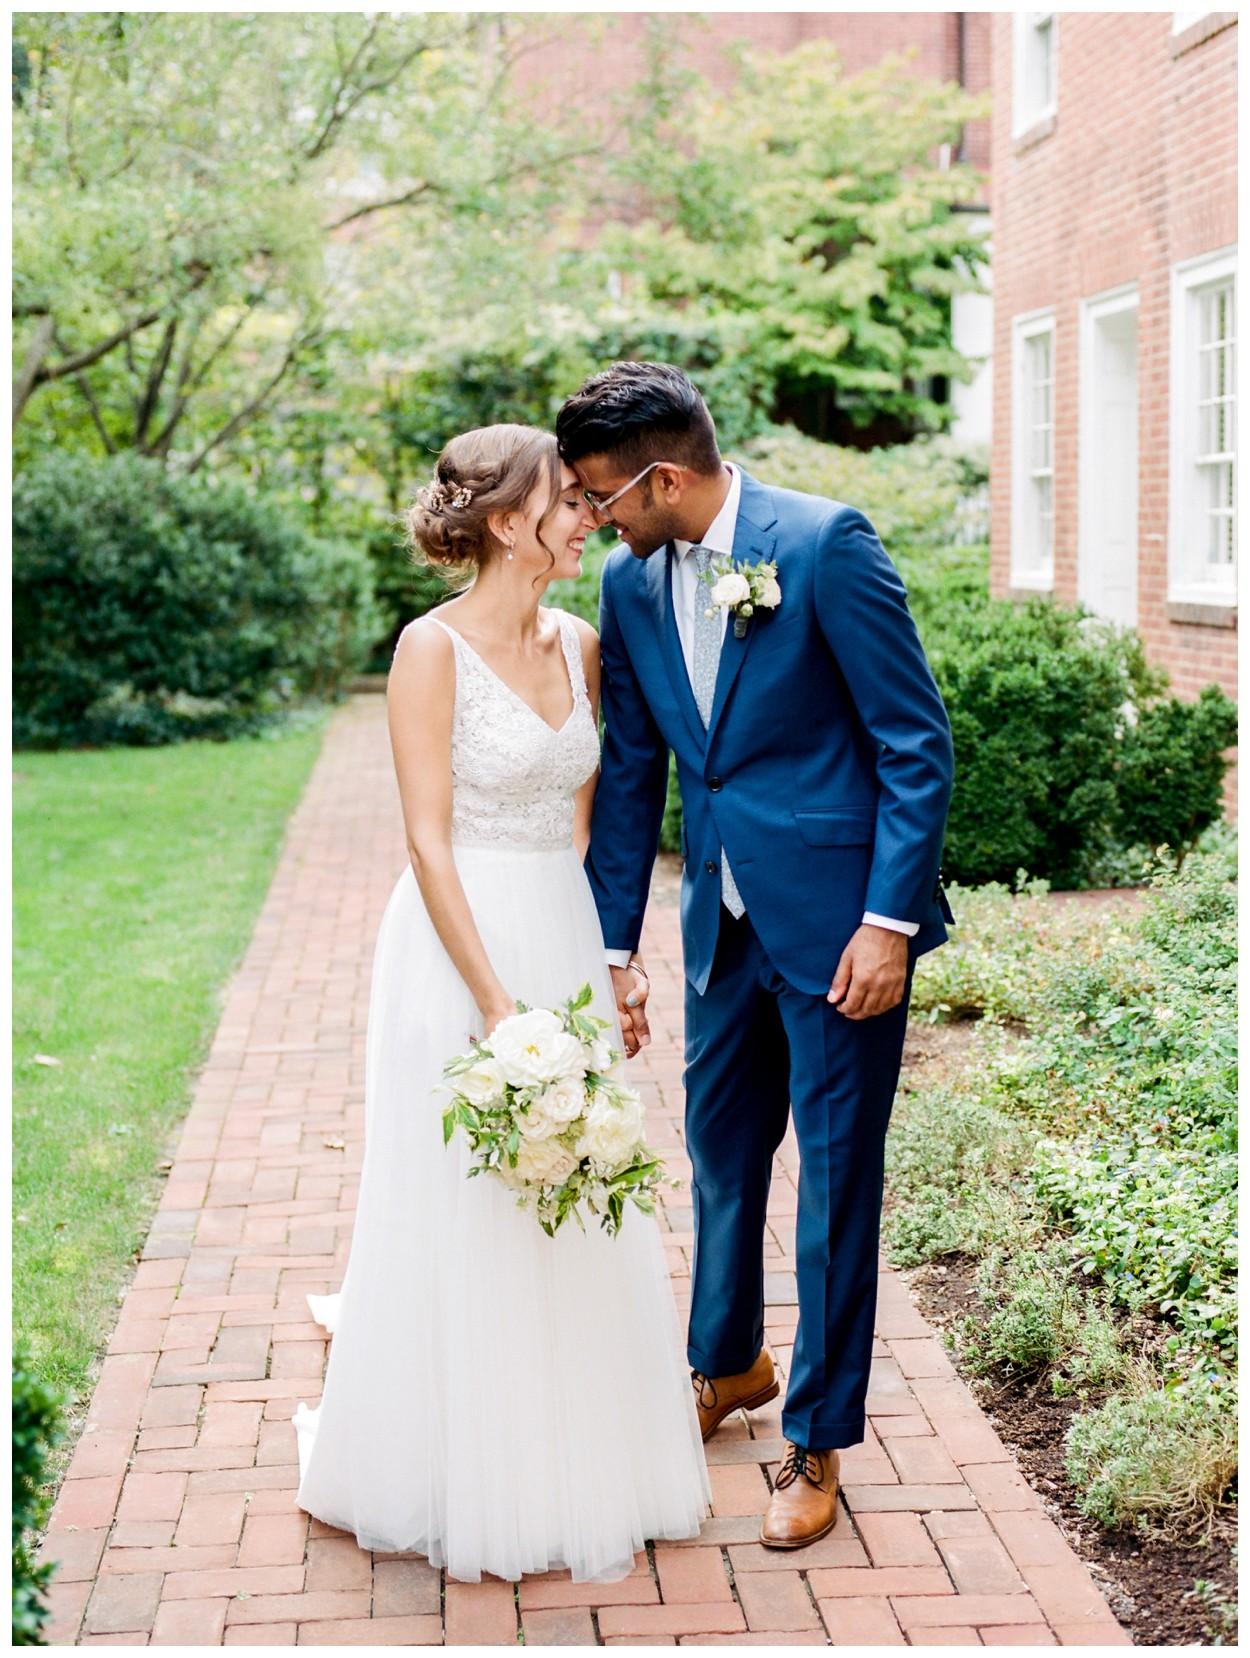 Fall Garden Wedding at Dumbarton House in Washington DC by fine art wedding photographer Lissa Ryan Photography